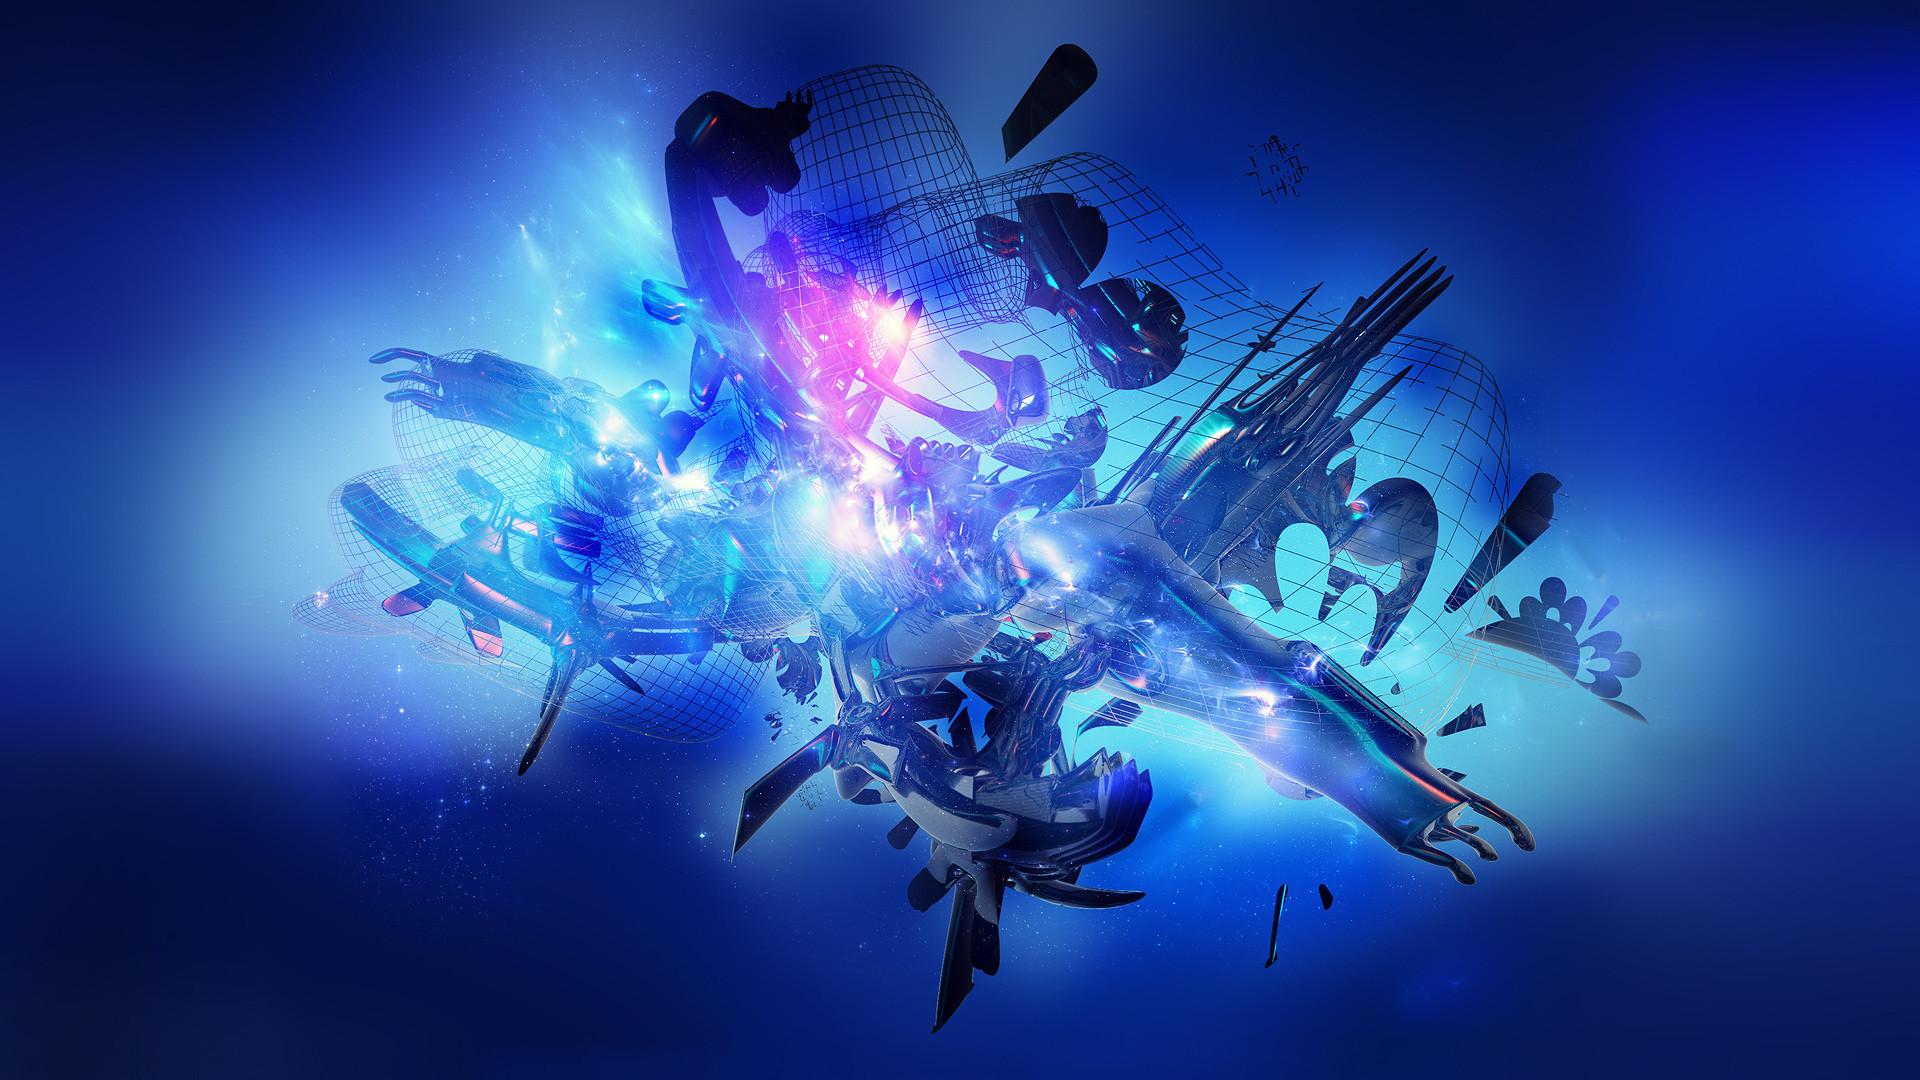 Cool sci-fi wallpaper 4k desktop background free download